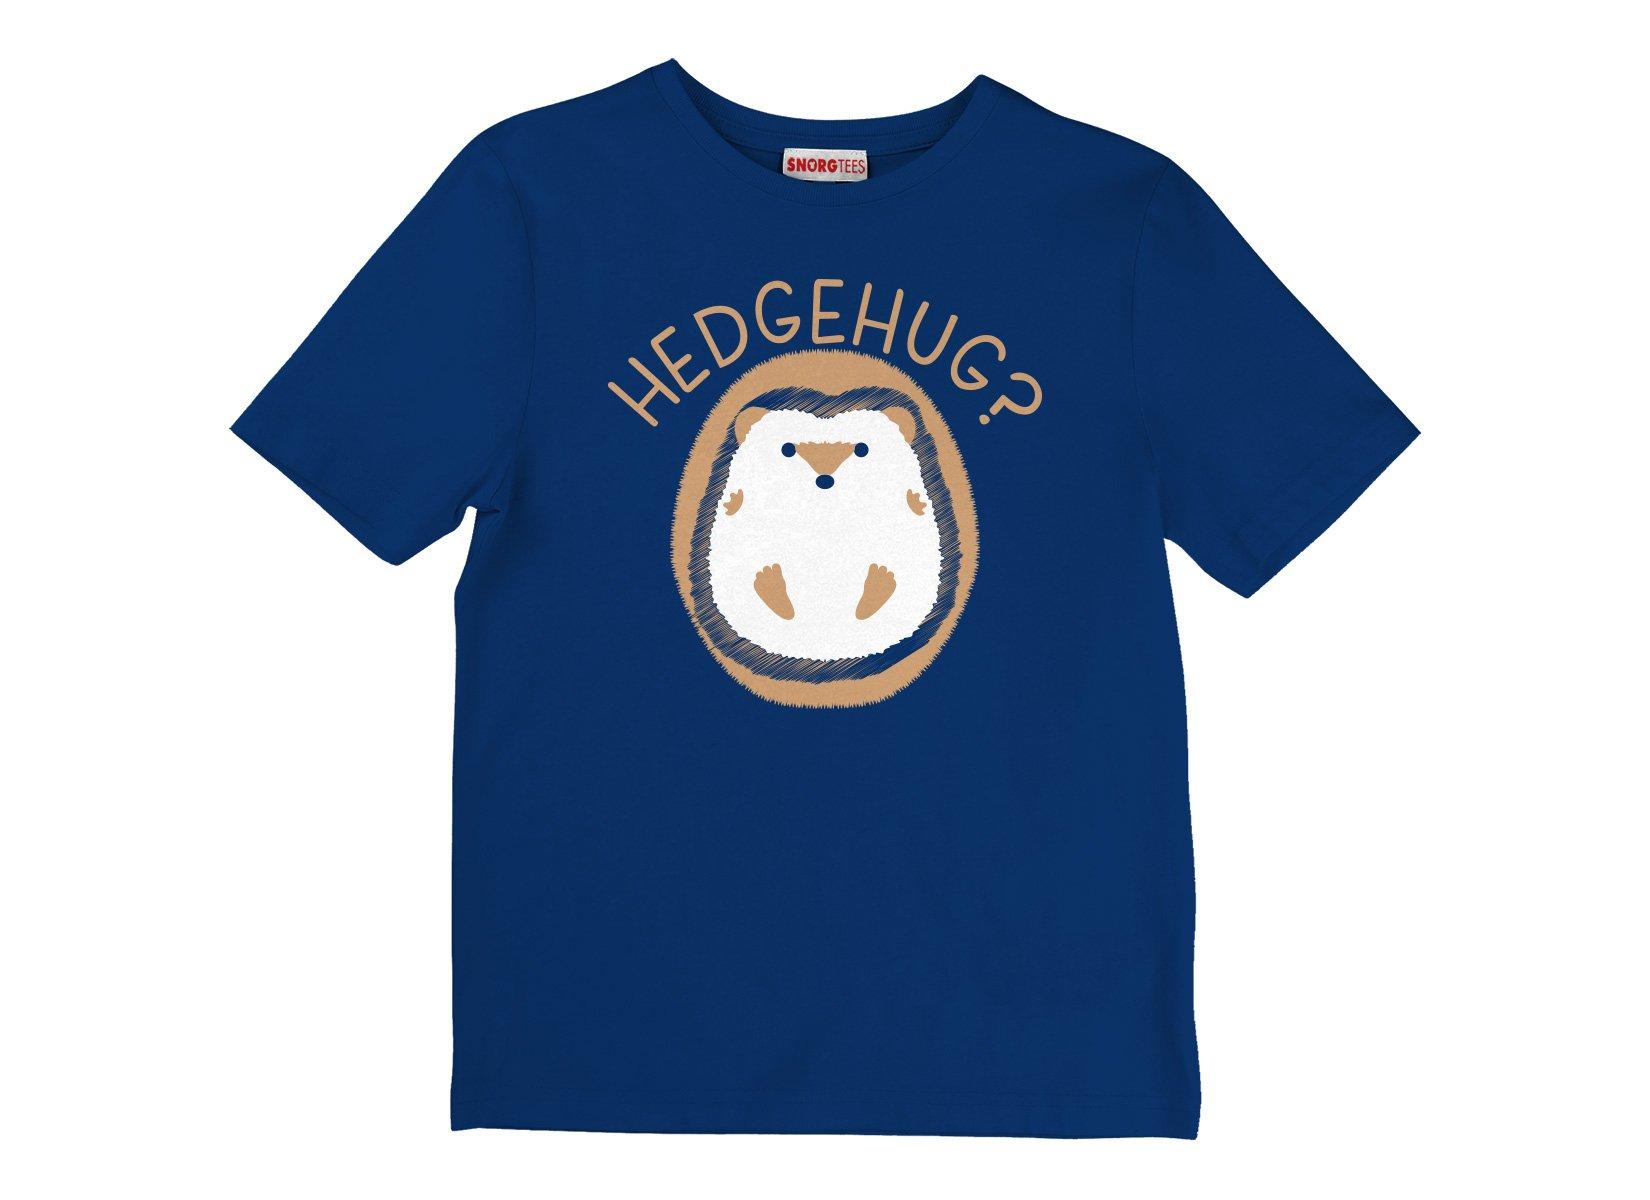 Hedgehug on Kids T-Shirt